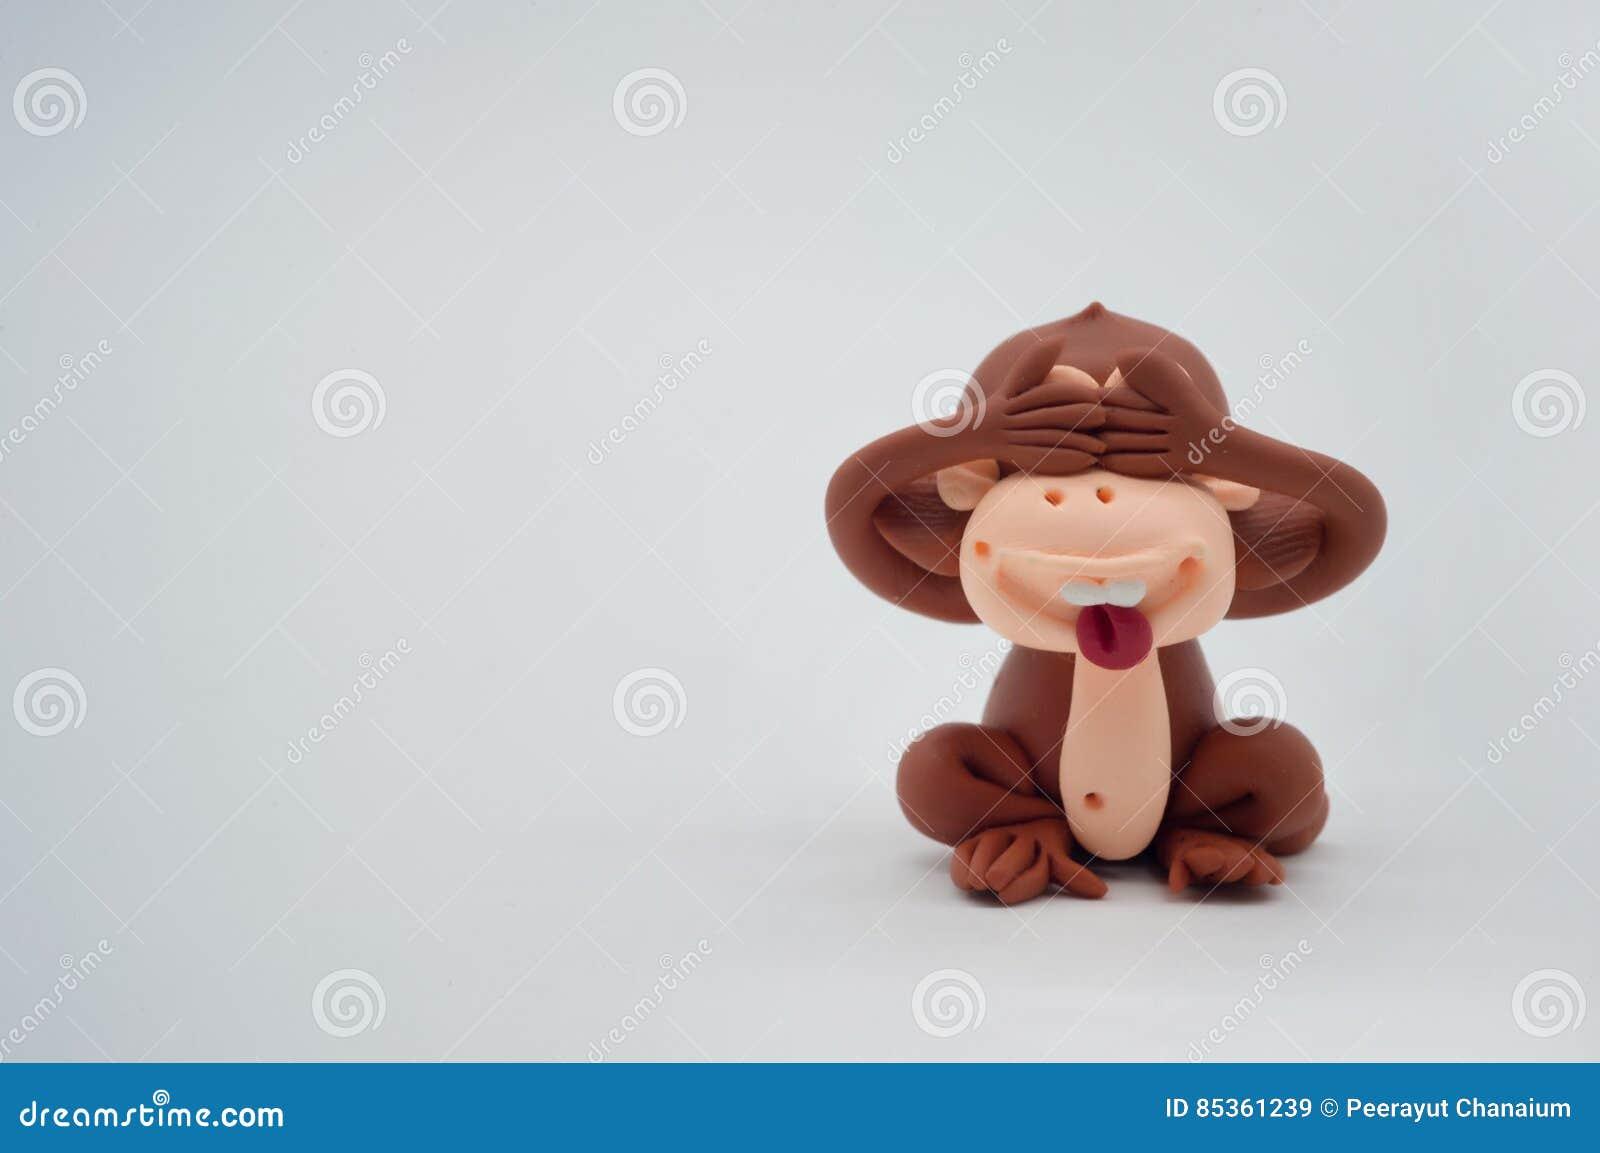 Brown monkey doll close eyes on white background